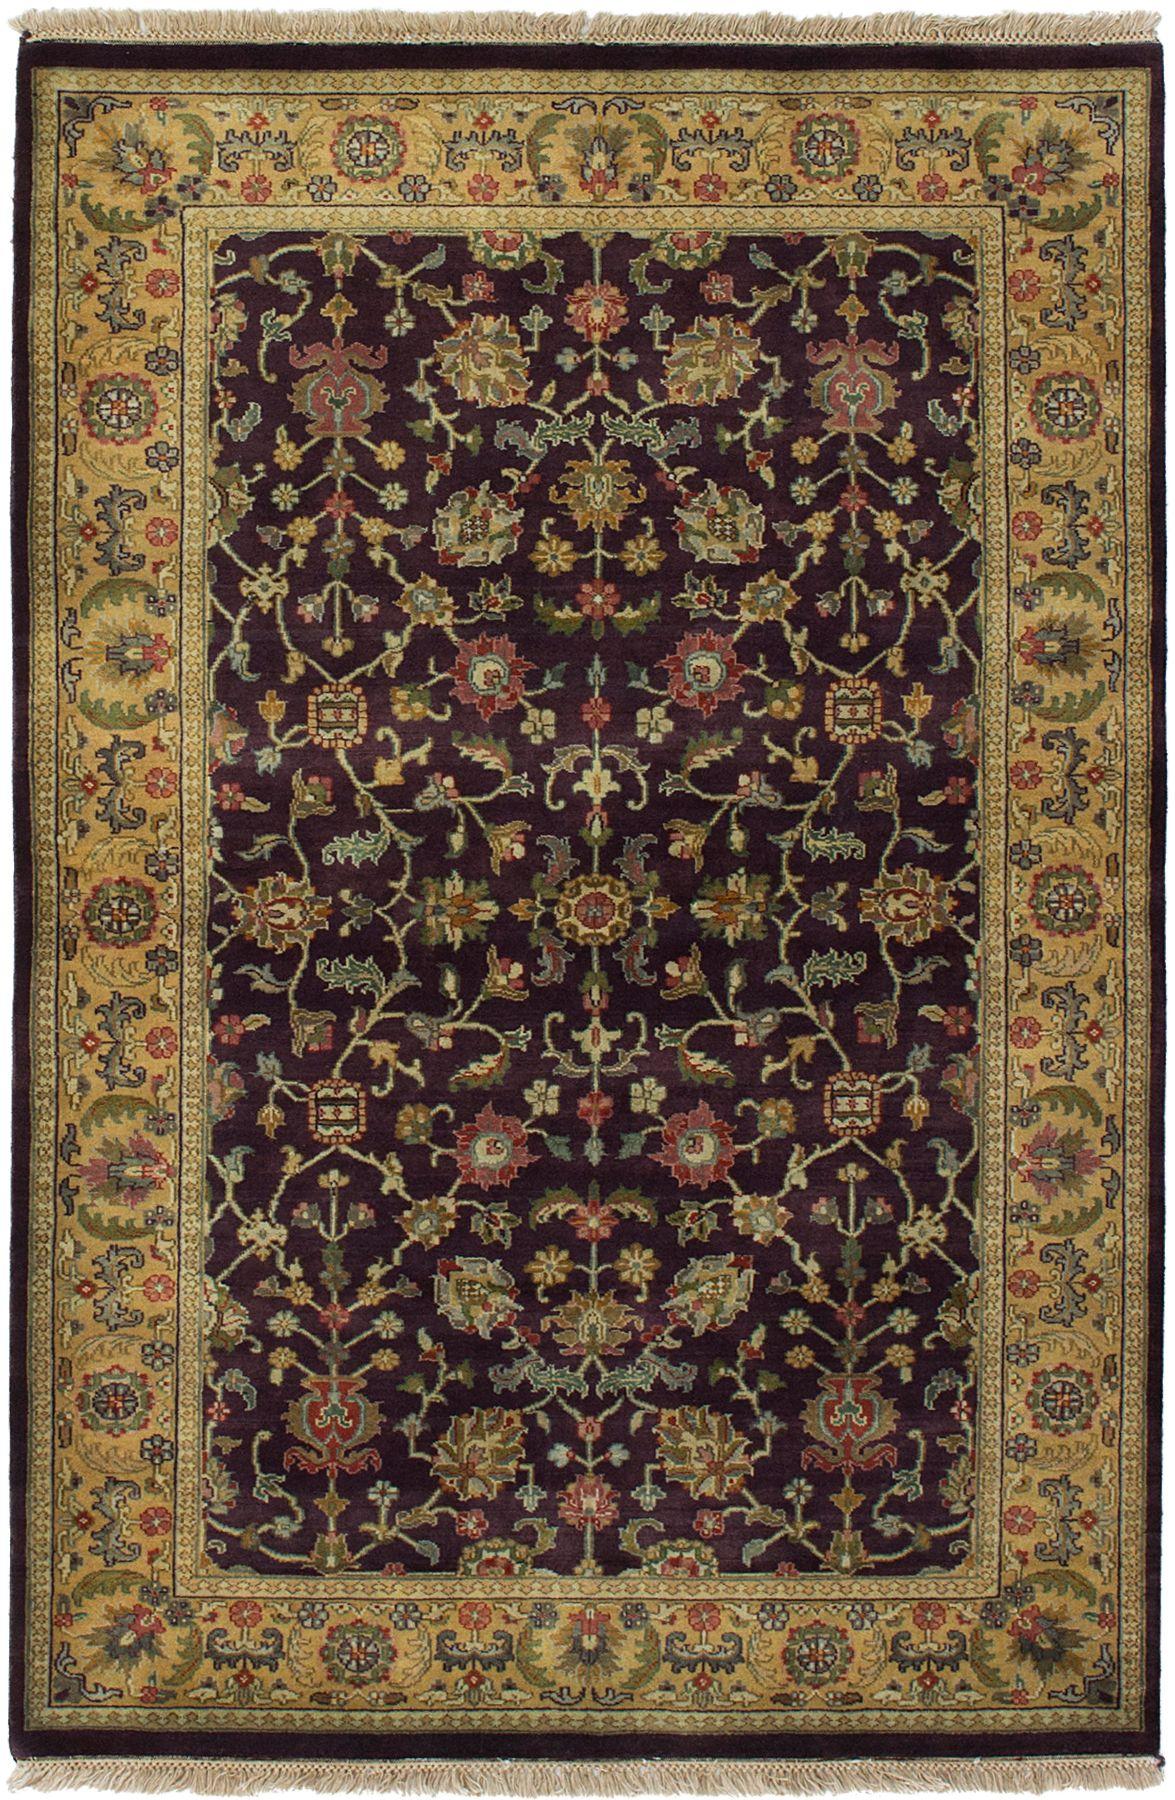 "Hand-knotted Jamshidpour Dark Burgundy Wool Rug 4'1"" x 6'2"" Size: 4'1"" x 6'2"""